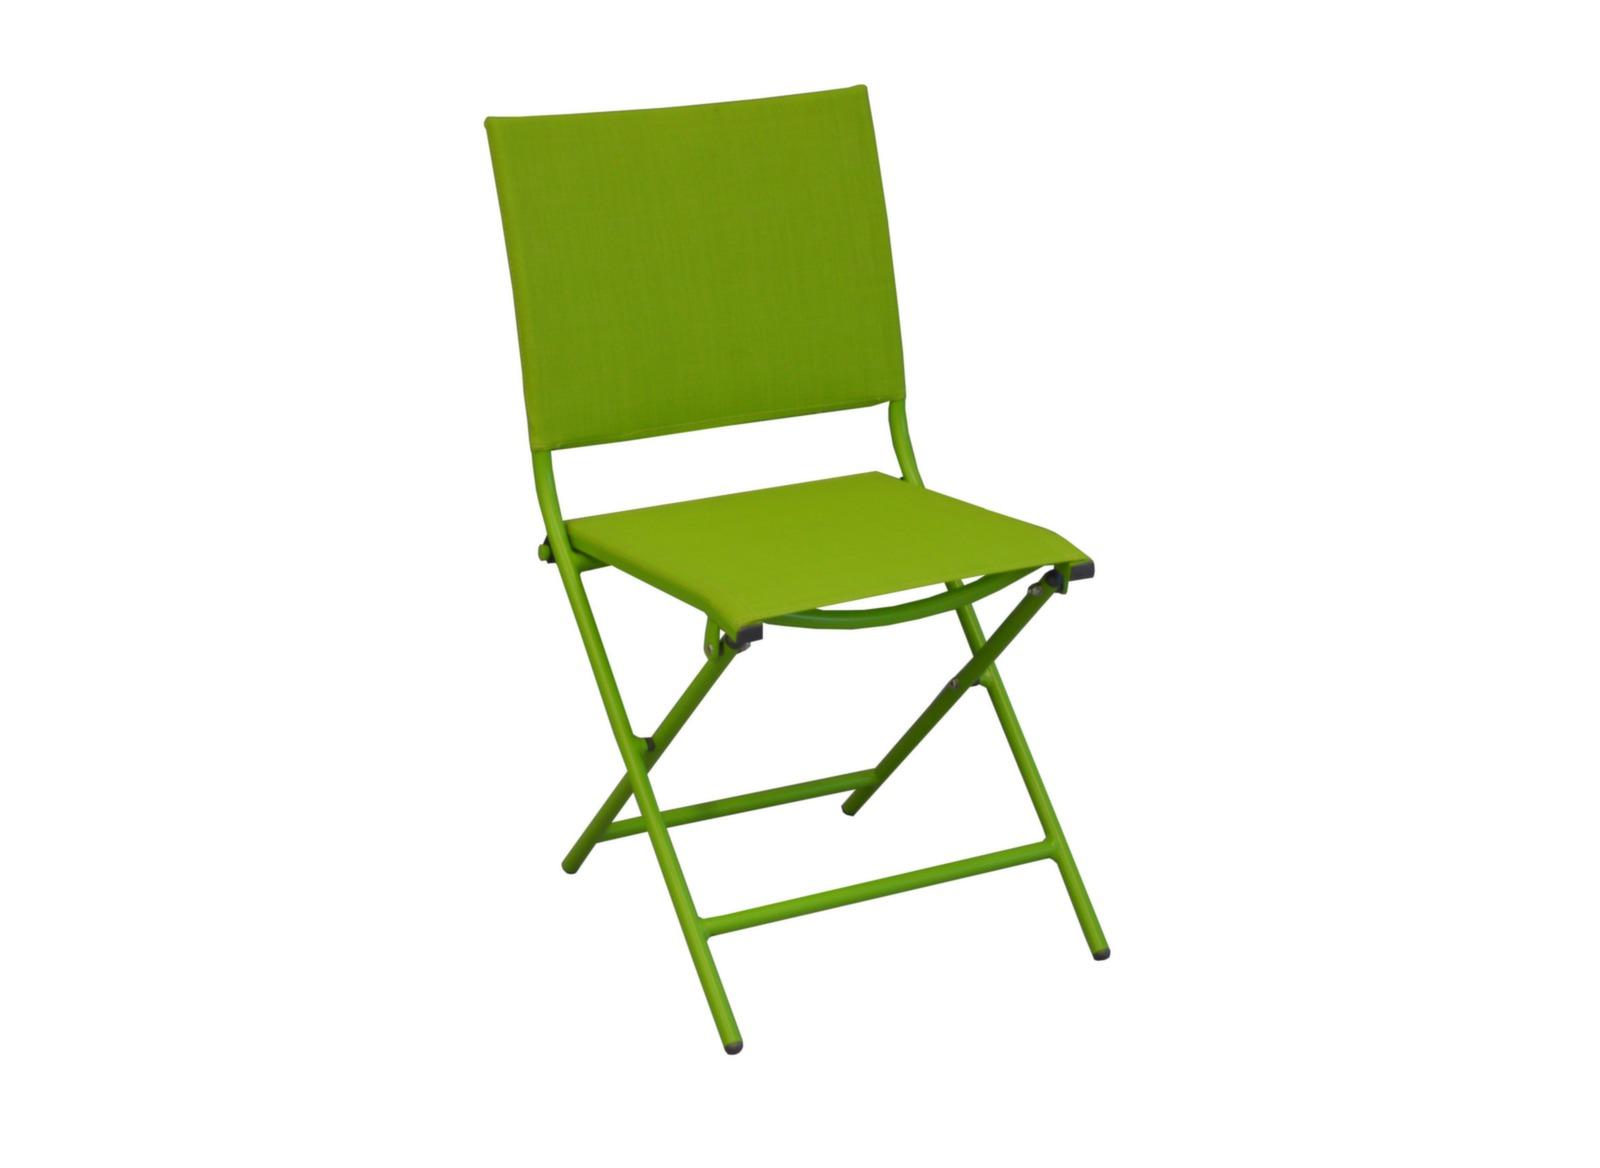 Chaise De Jardin Pliante Et Verte Globe Proloisirs